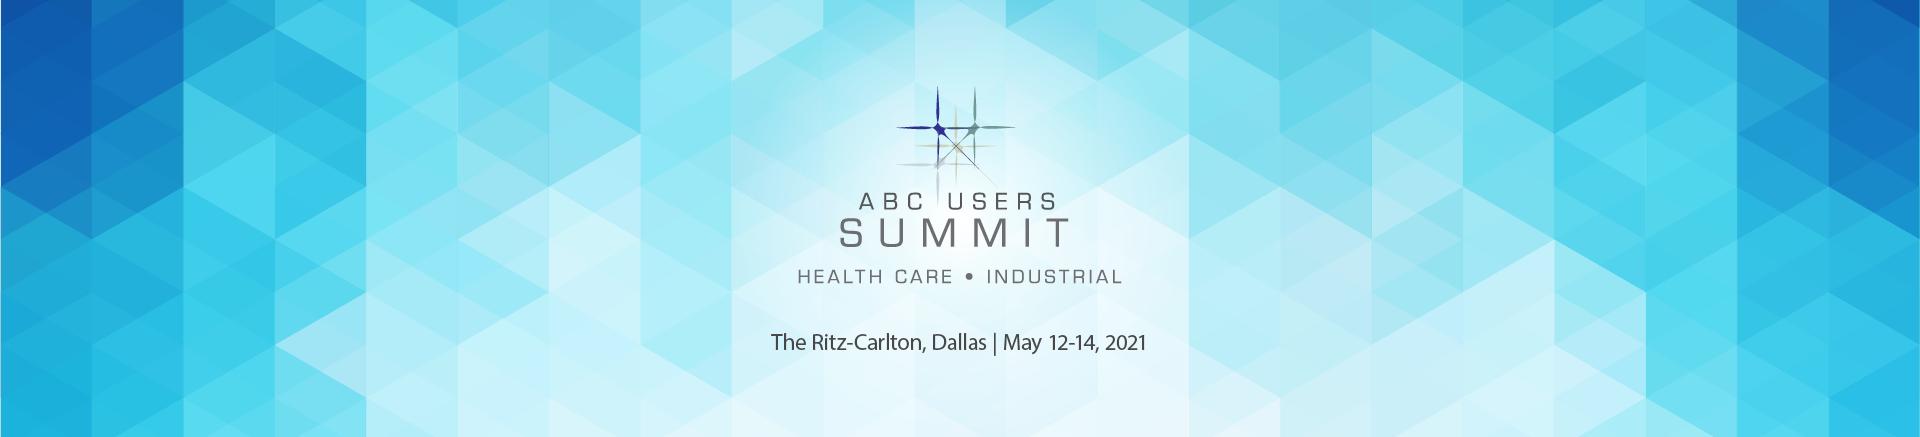 2021 ABC Users Summit